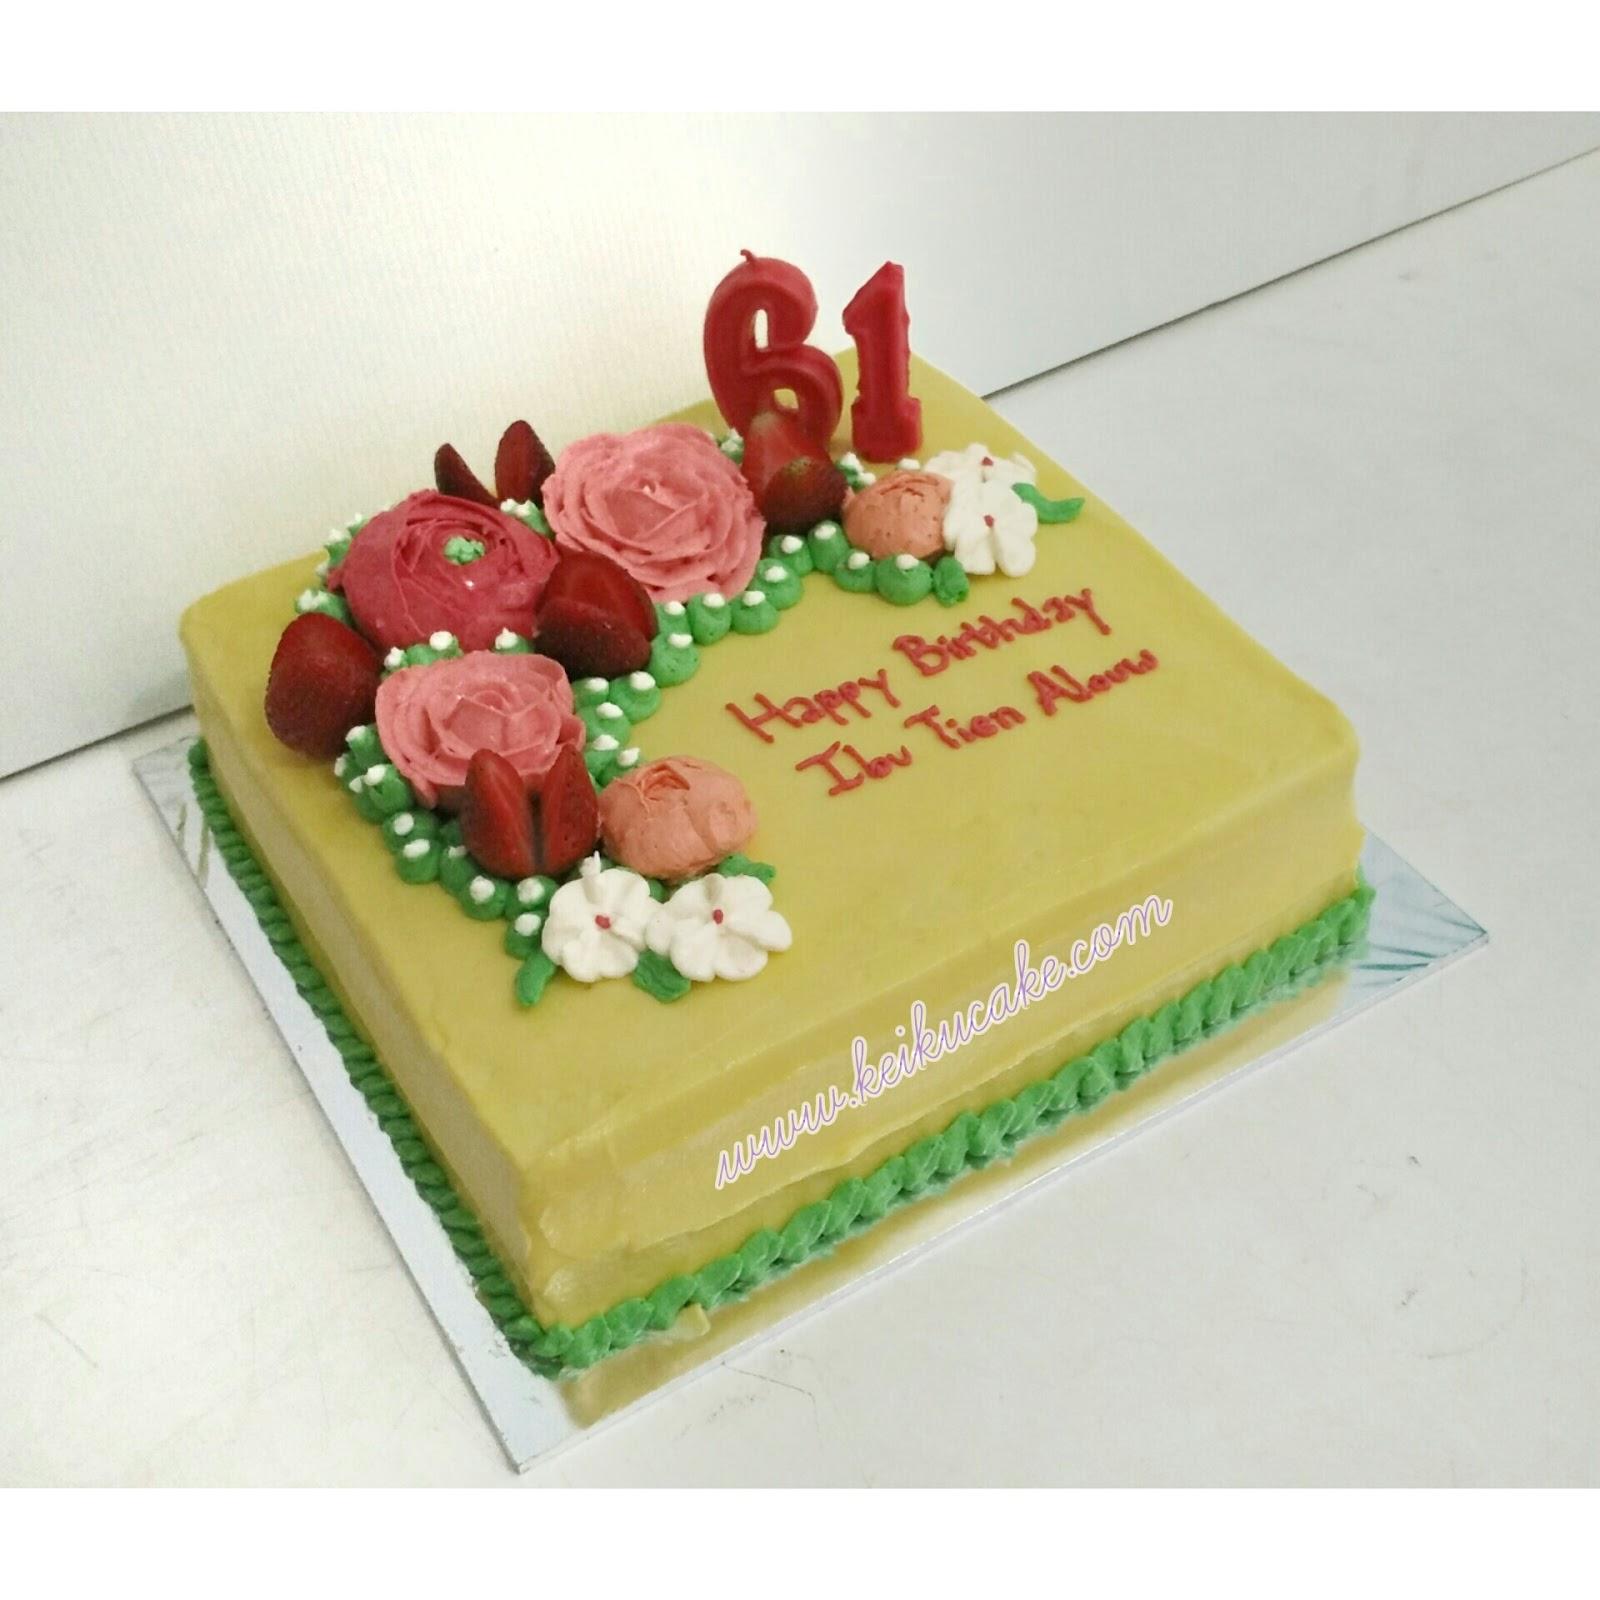 Keiku Cake: Square cake flower and strawberries cake